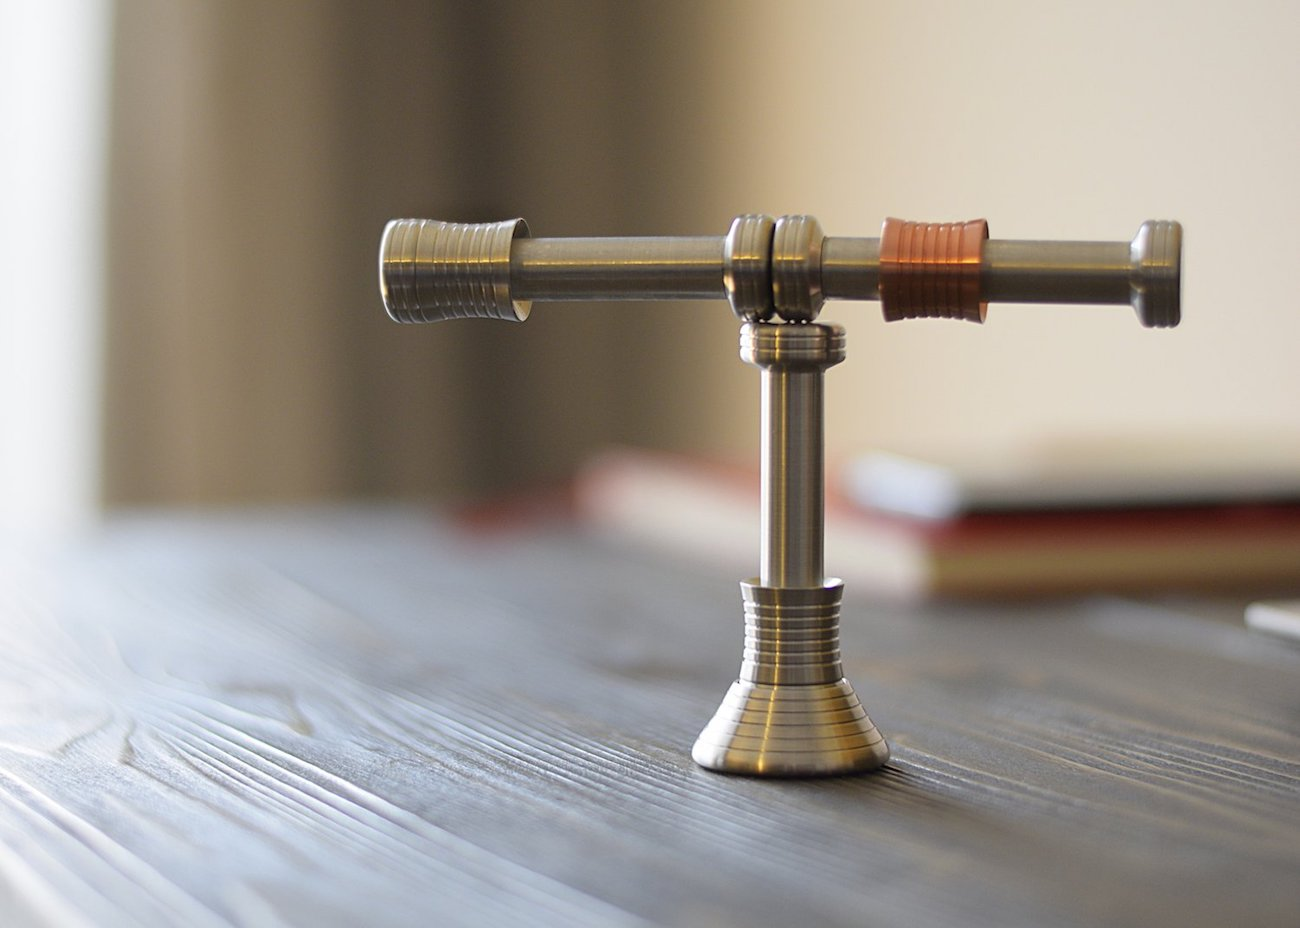 Moondrop Gravity Defying Fidget Desk Toy